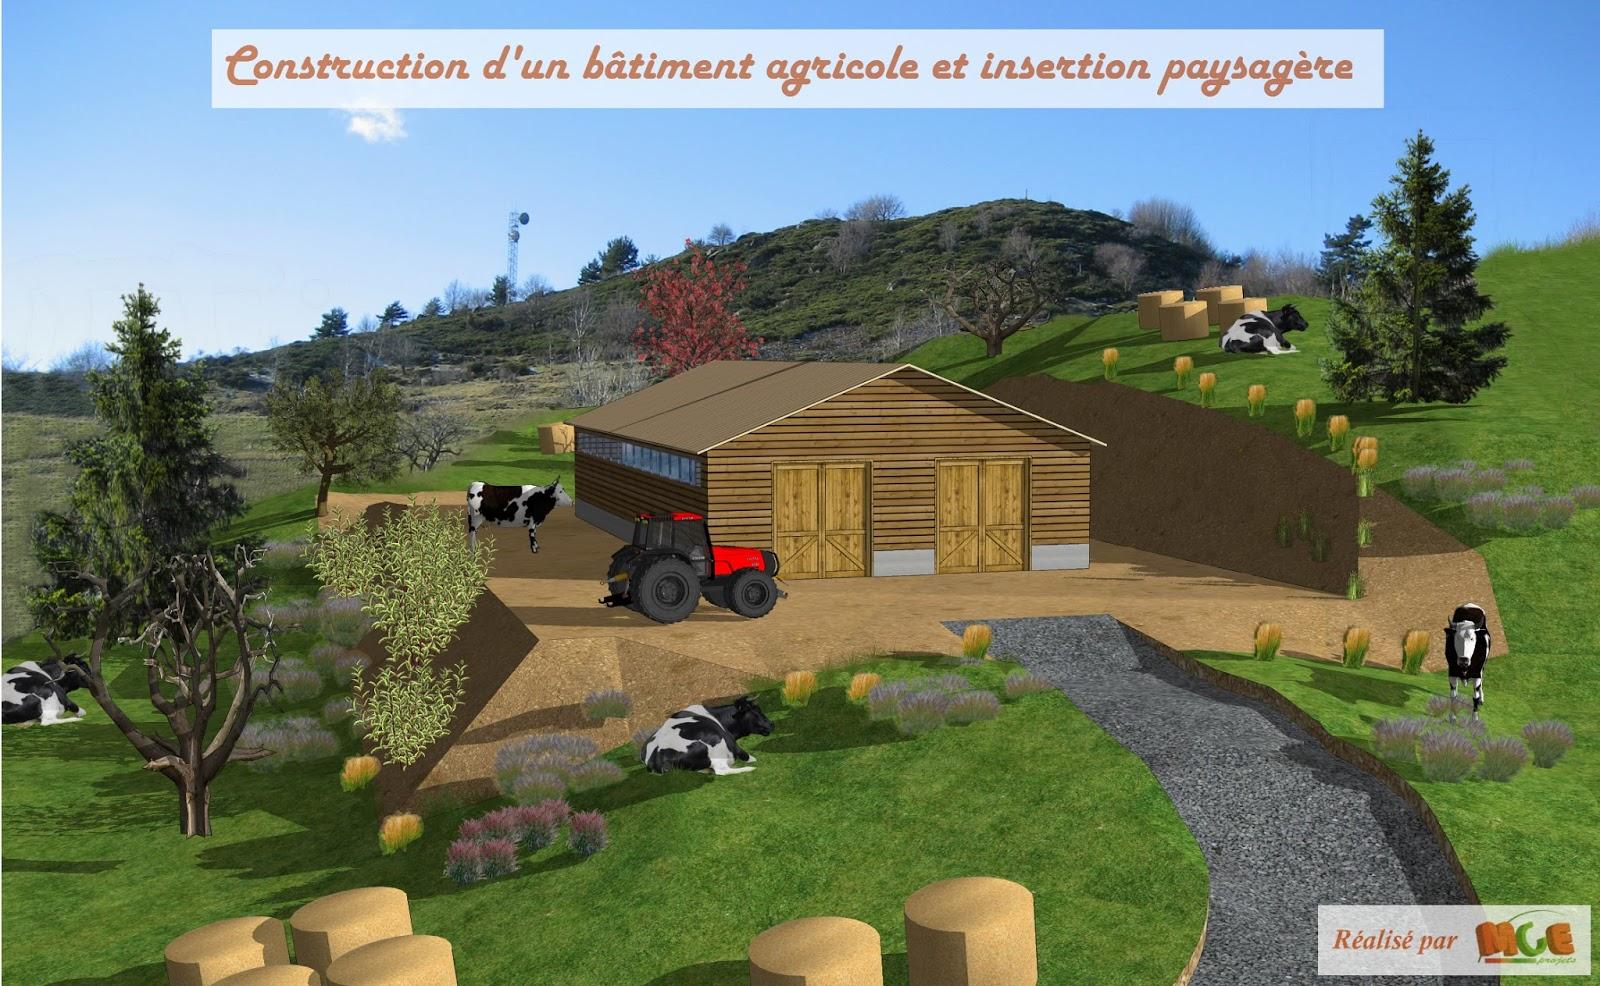 construire un hangar agricole id es d coration id es. Black Bedroom Furniture Sets. Home Design Ideas